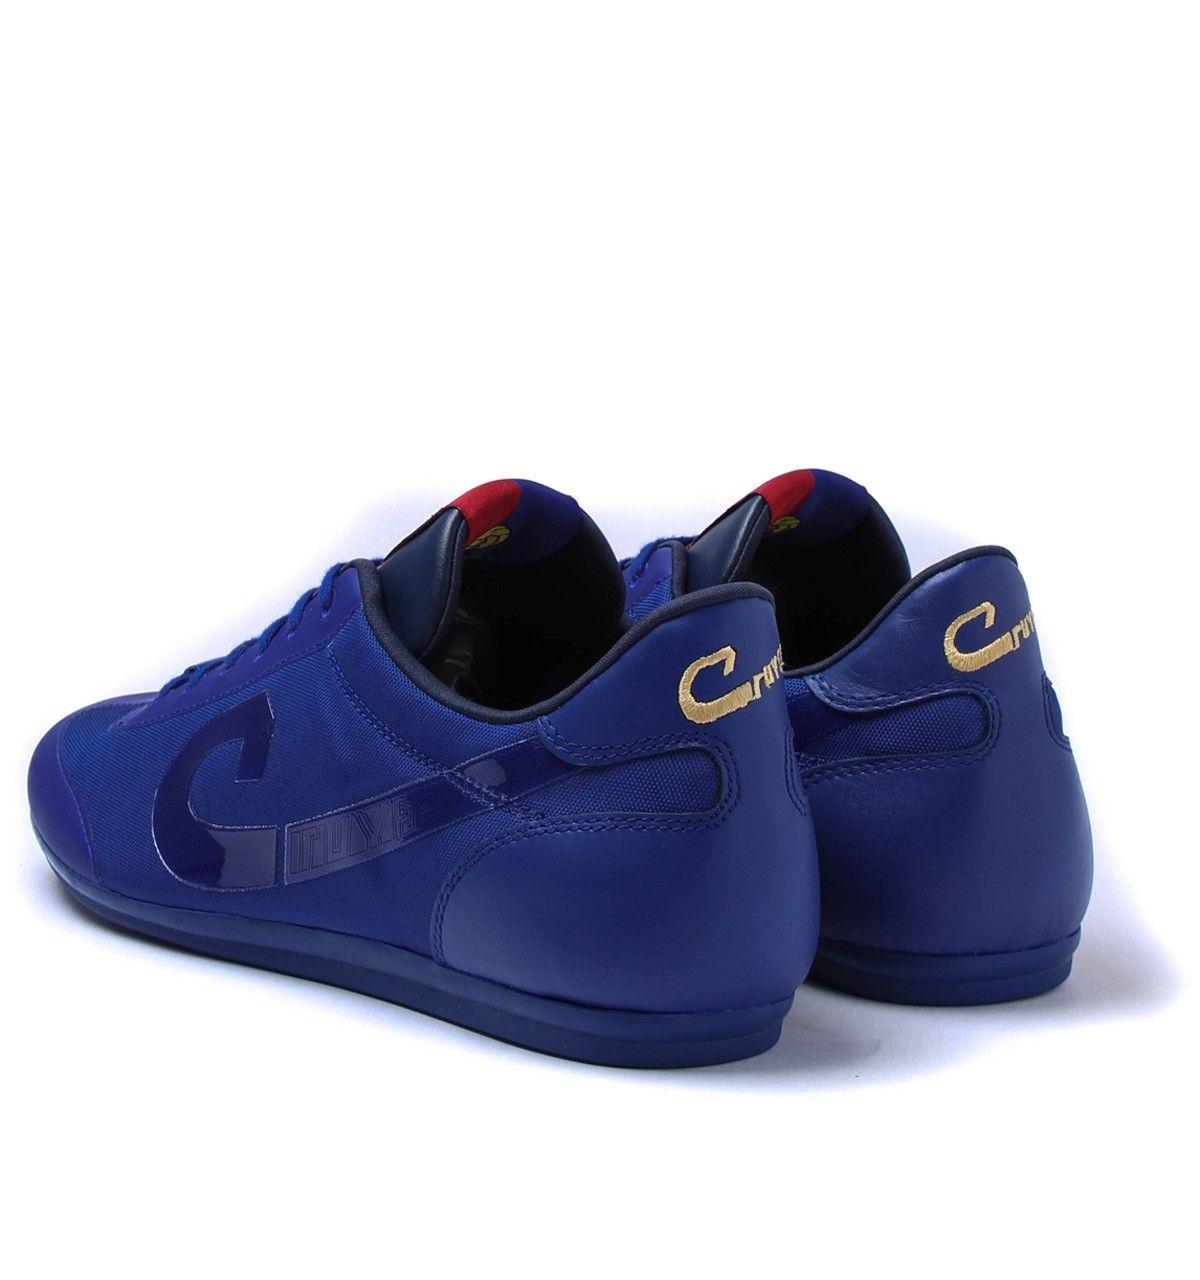 Cruyff Vanenburg X Lite Tech Blue Trainers #menswear #style